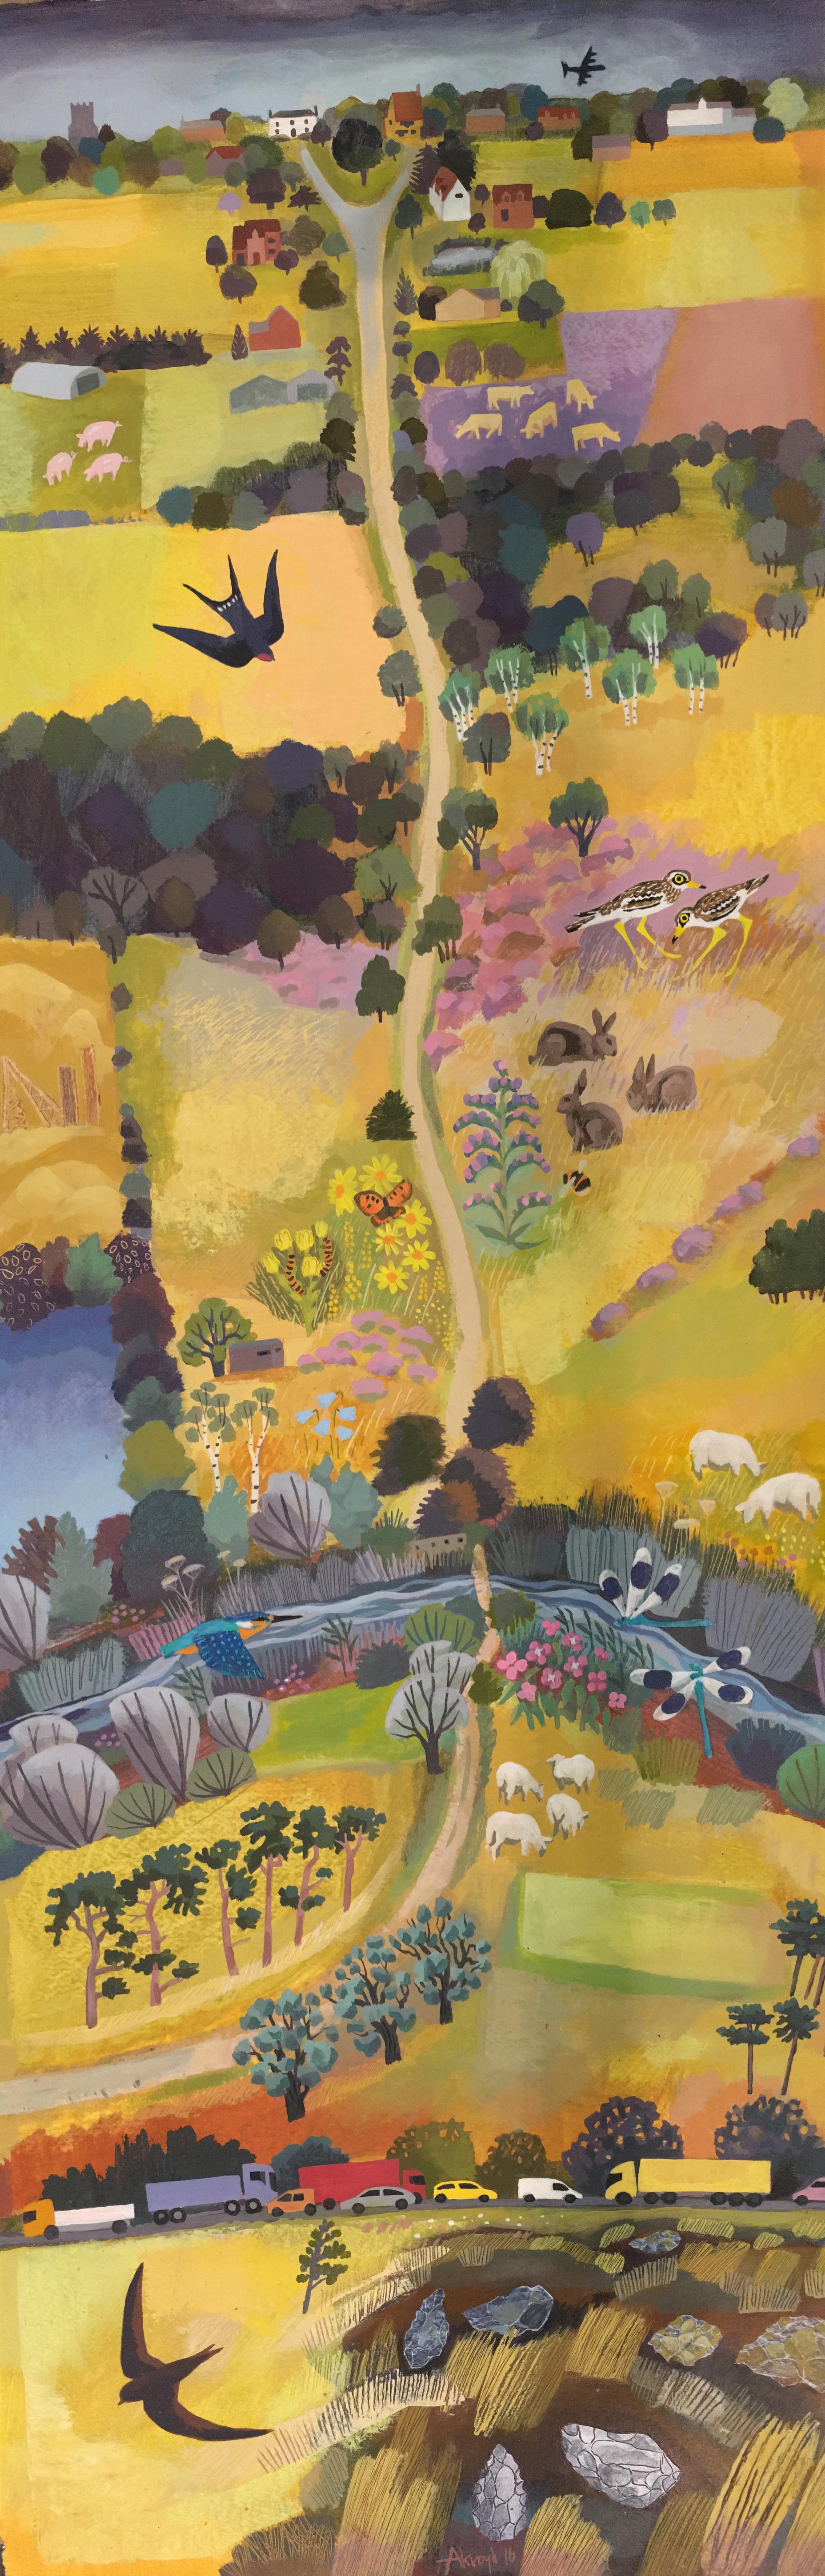 Painting of Icknield Way cutting across Cavenham heath